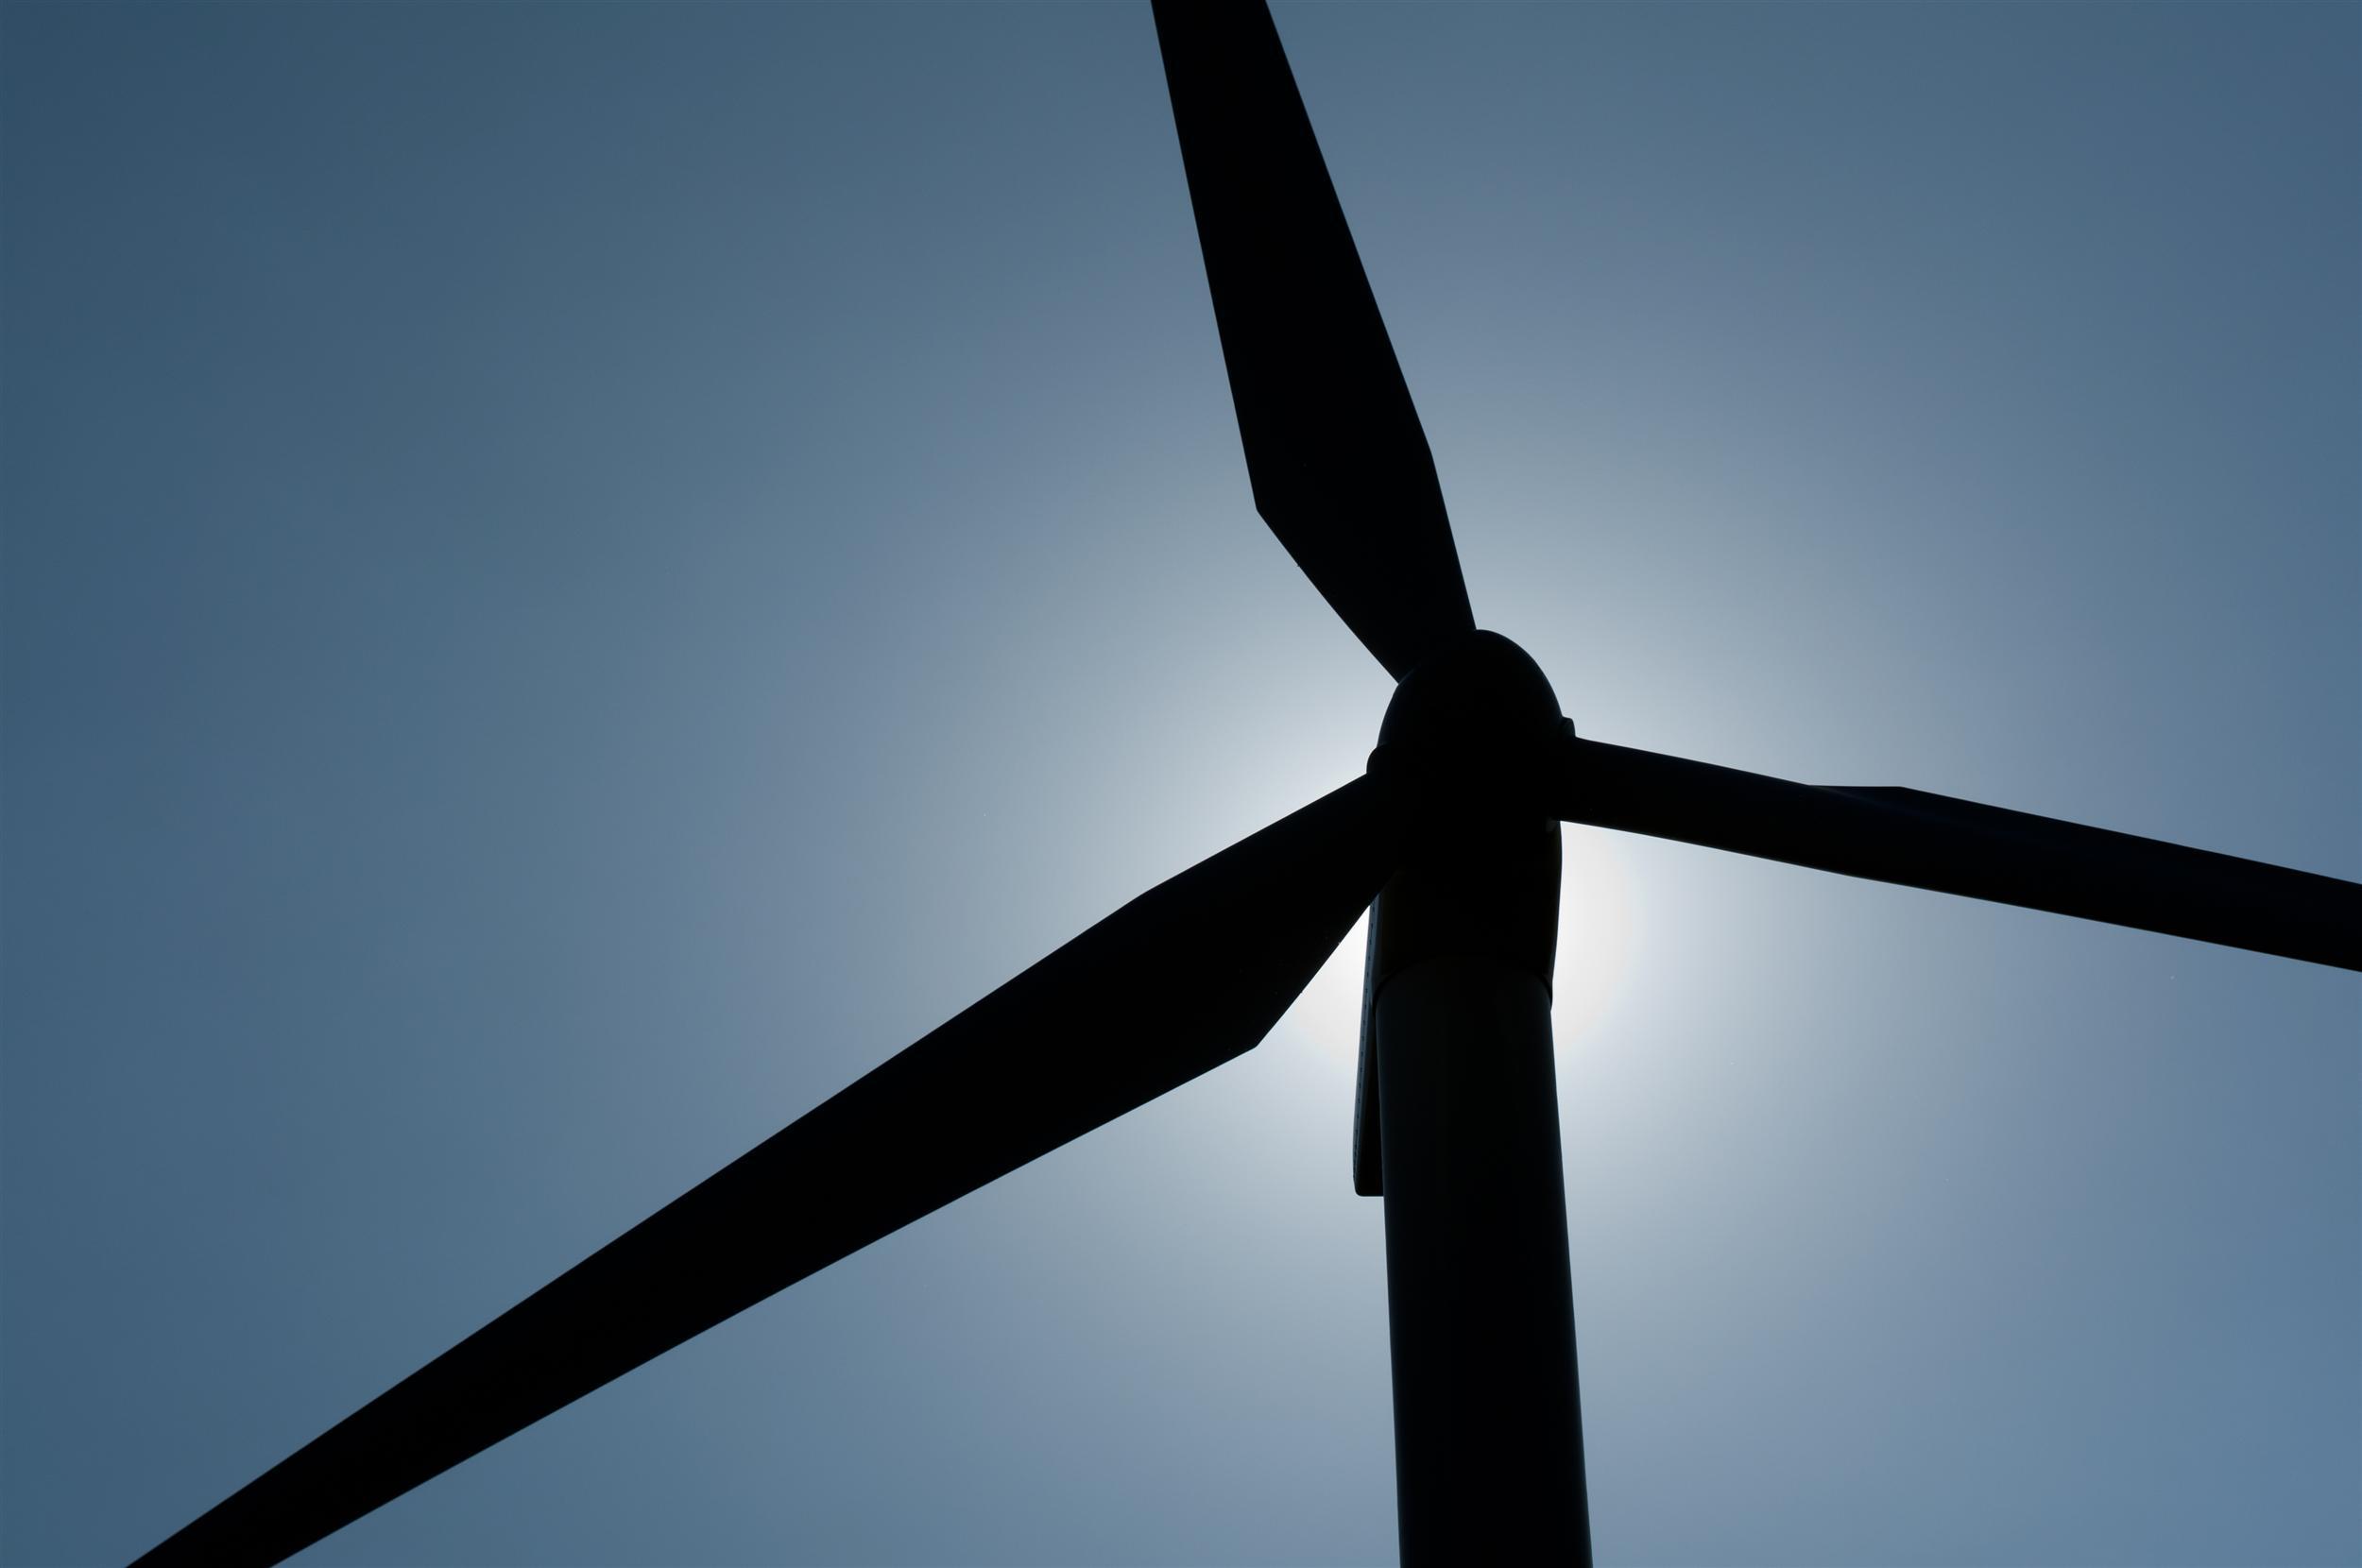 The sun creates a silhouette behind a wind turbine